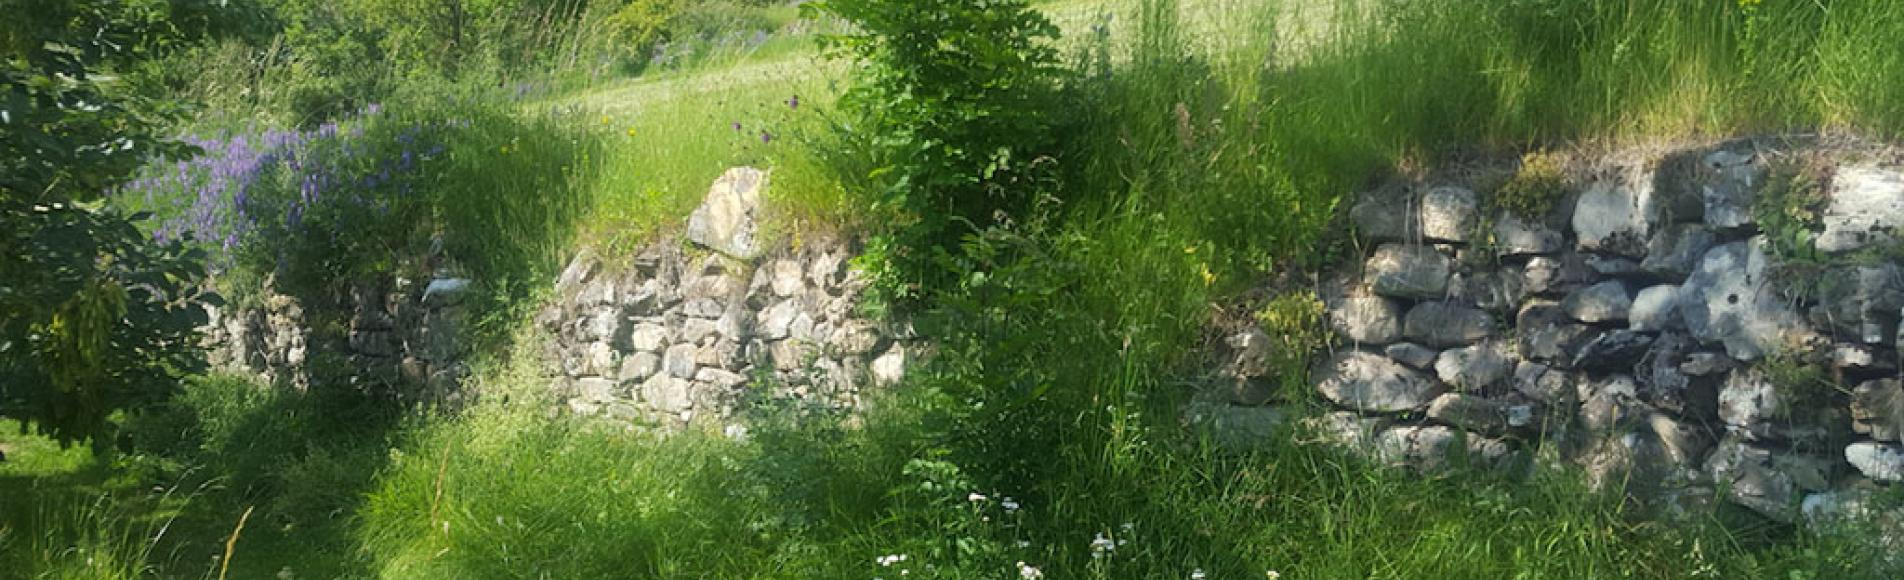 Chantier formation restauration muret Reallon - avant restauration - août 2018 - © S. Raymond - Parc national des Ecrins